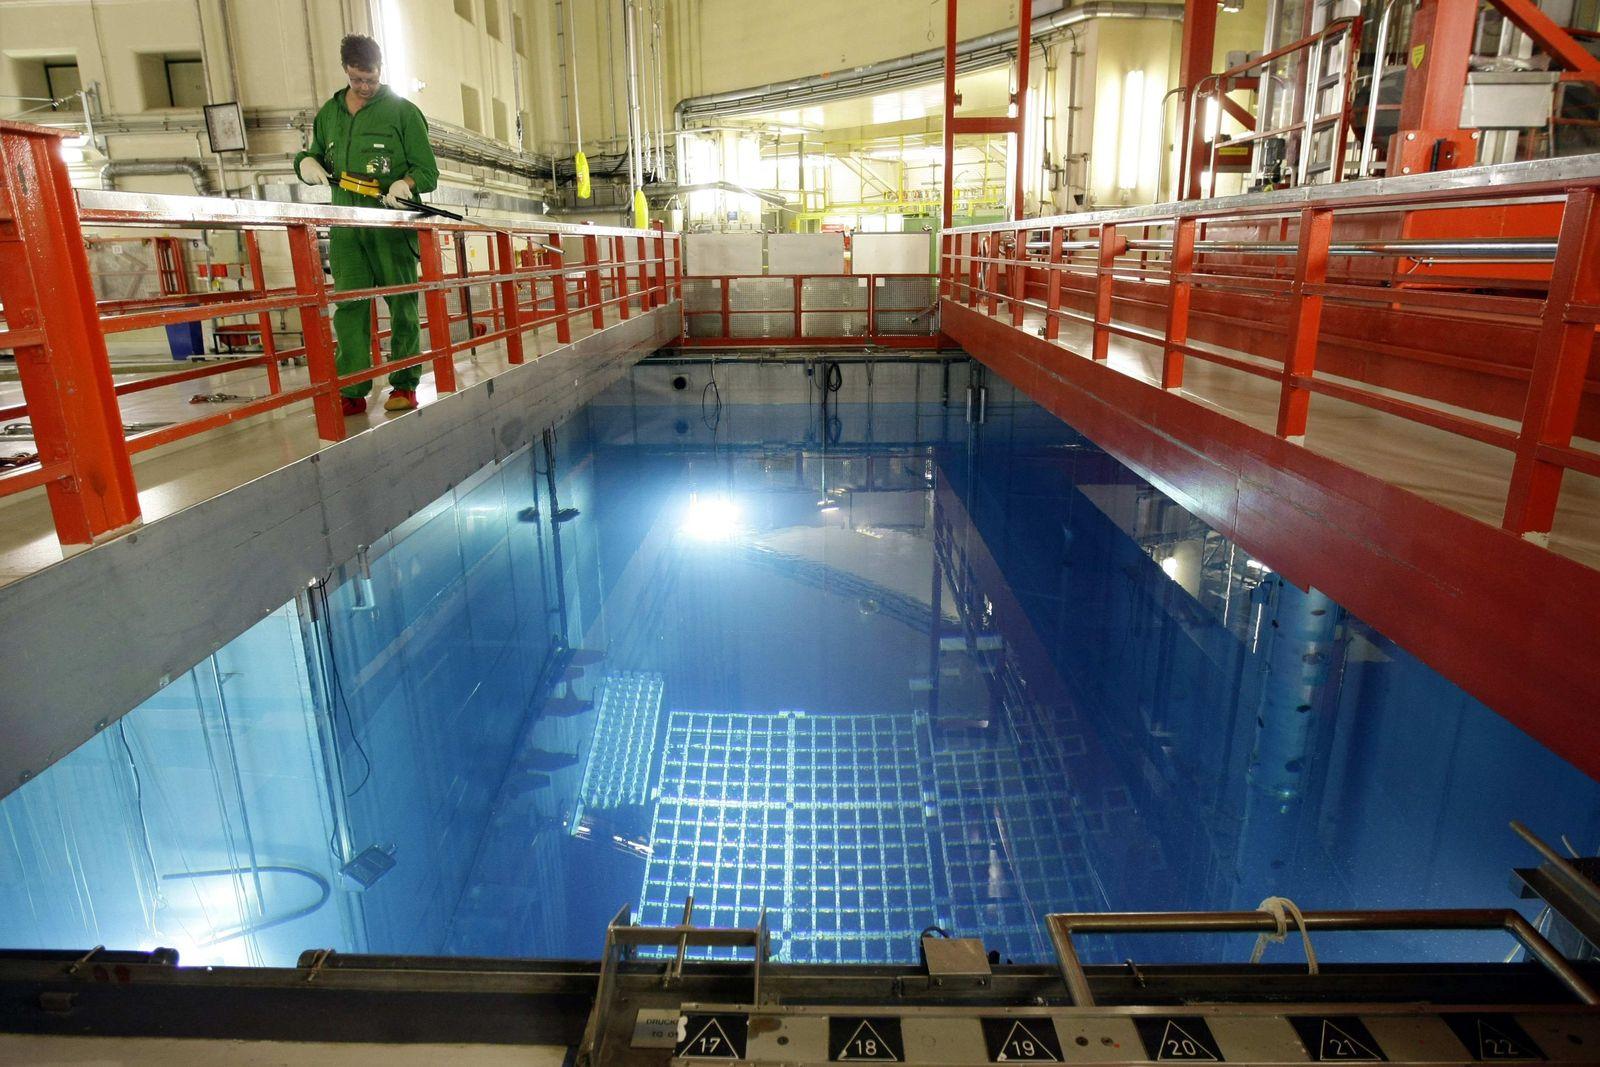 Atomkraftwerk AKW Biblis Block A